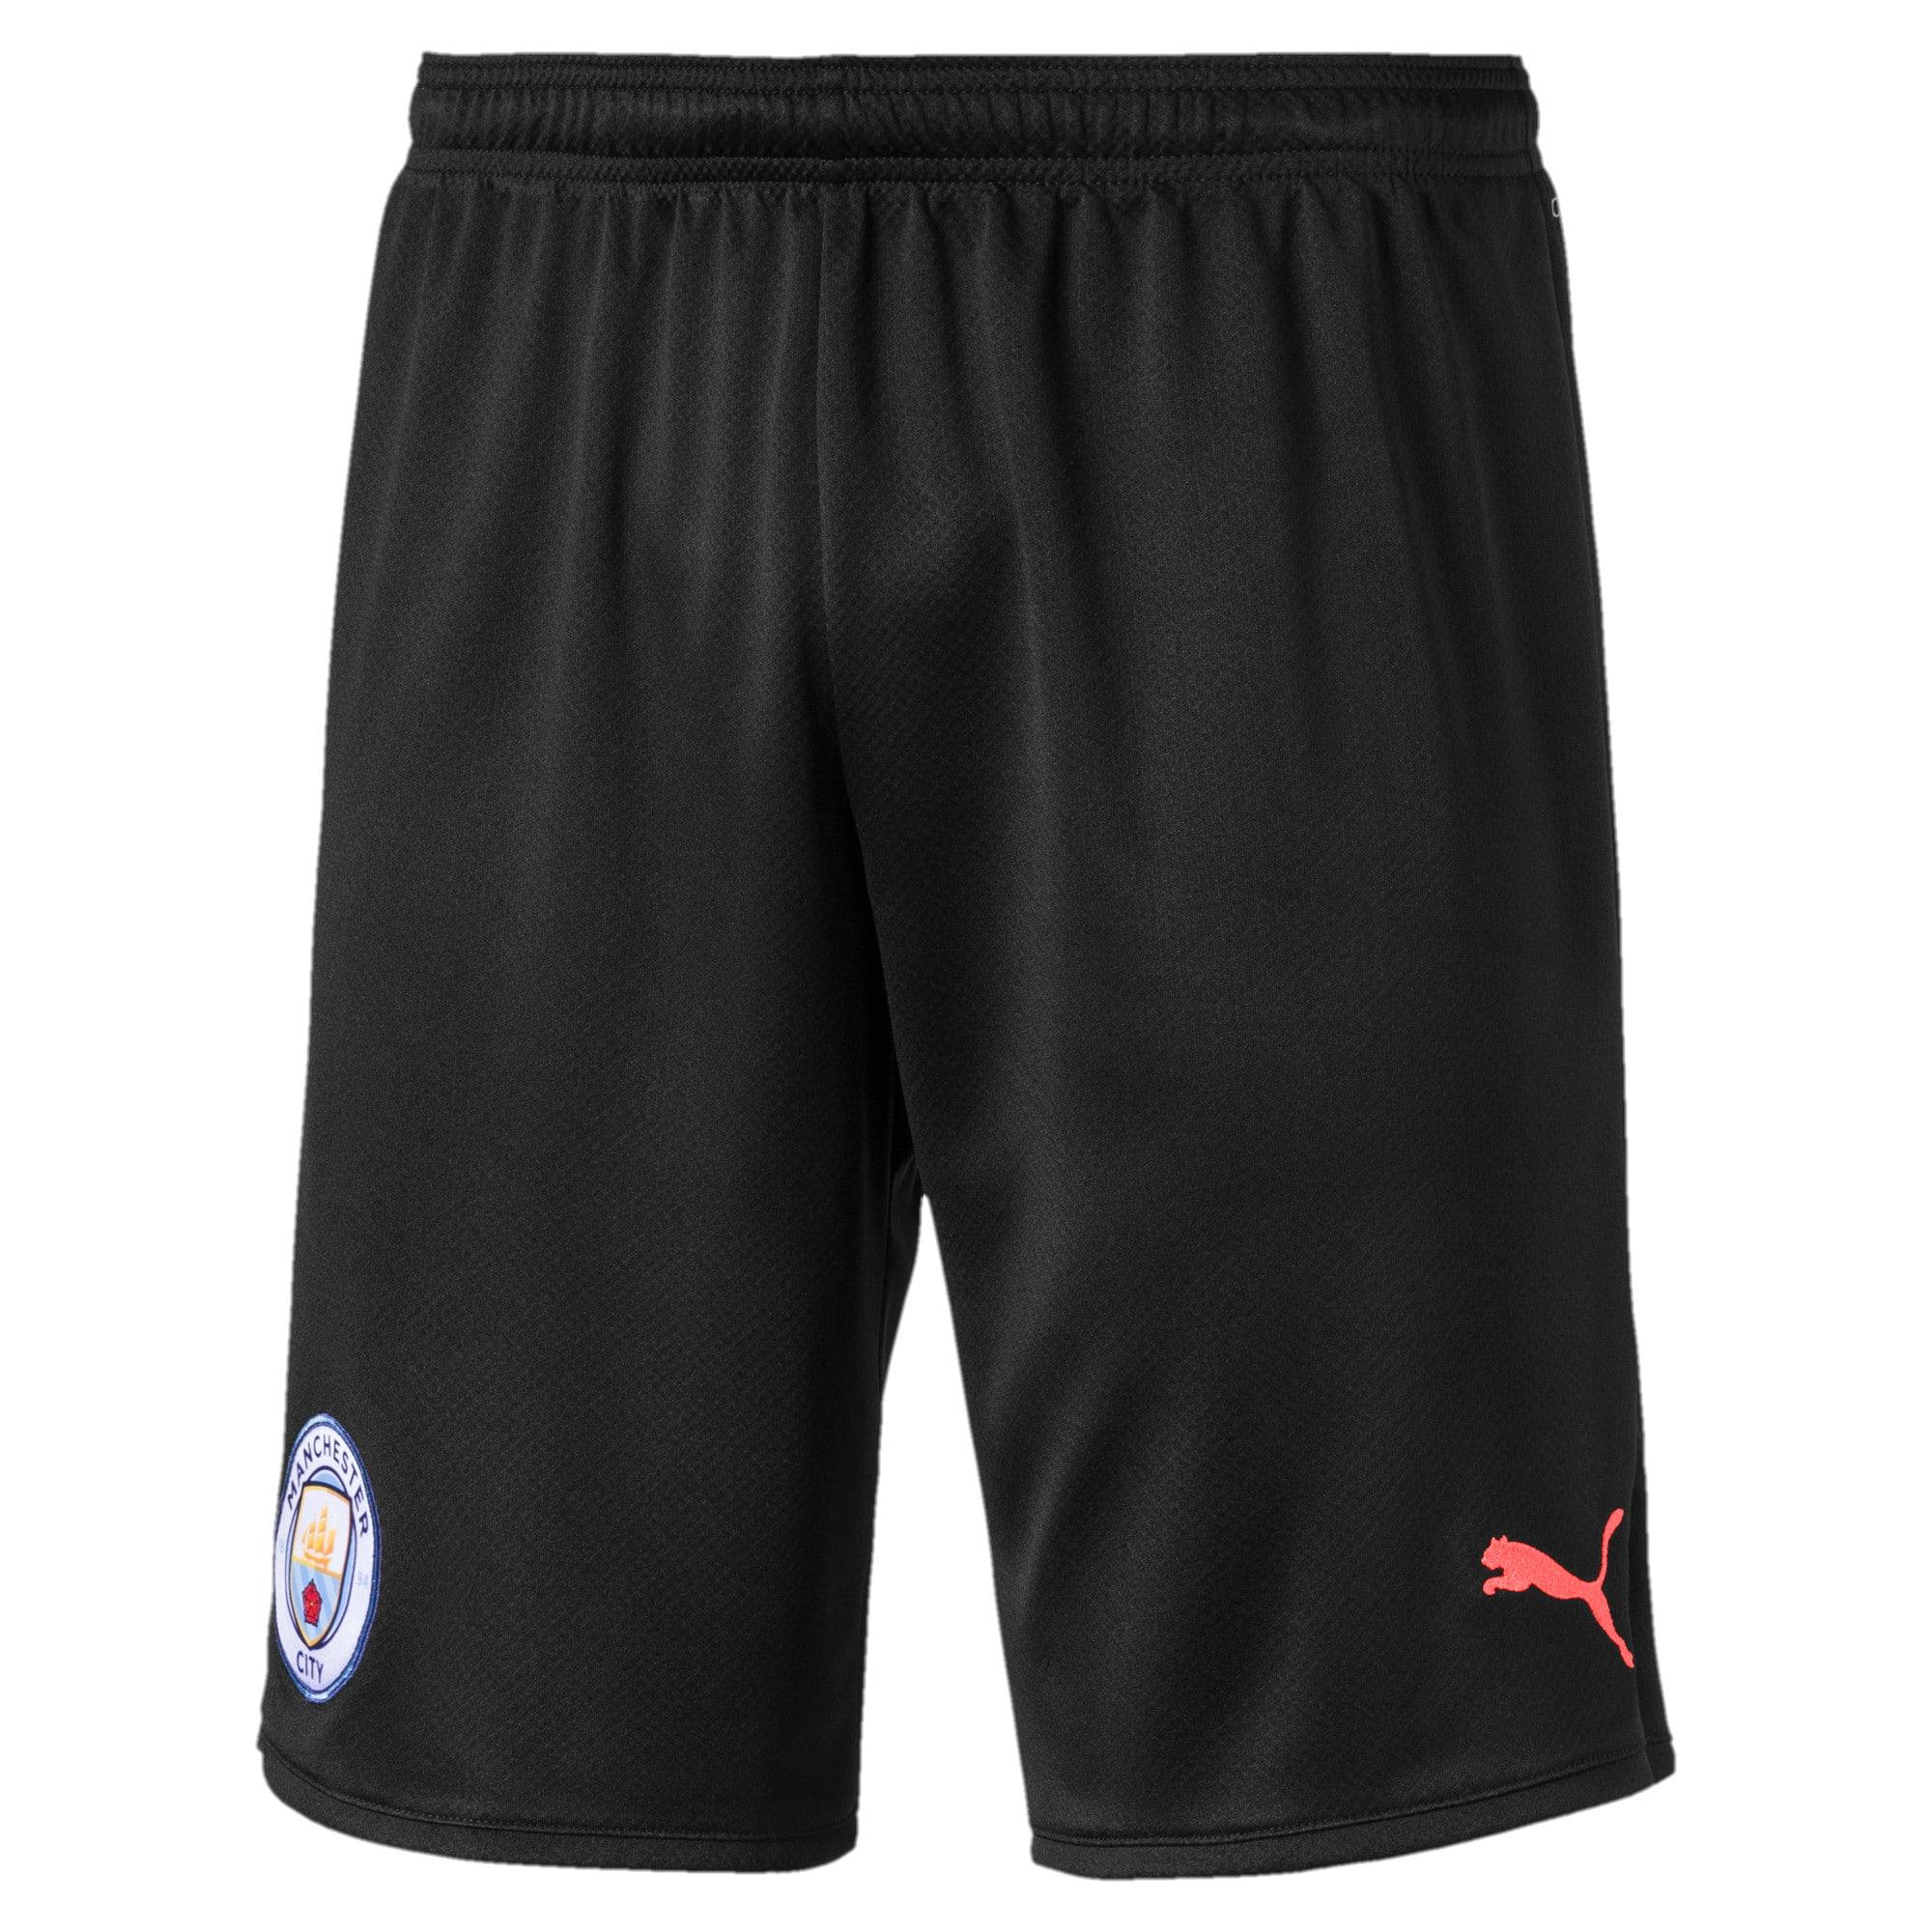 Thumbnail 1 of Manchester City Men's Third Replica Shorts, Puma Black-Georgia Peach, medium